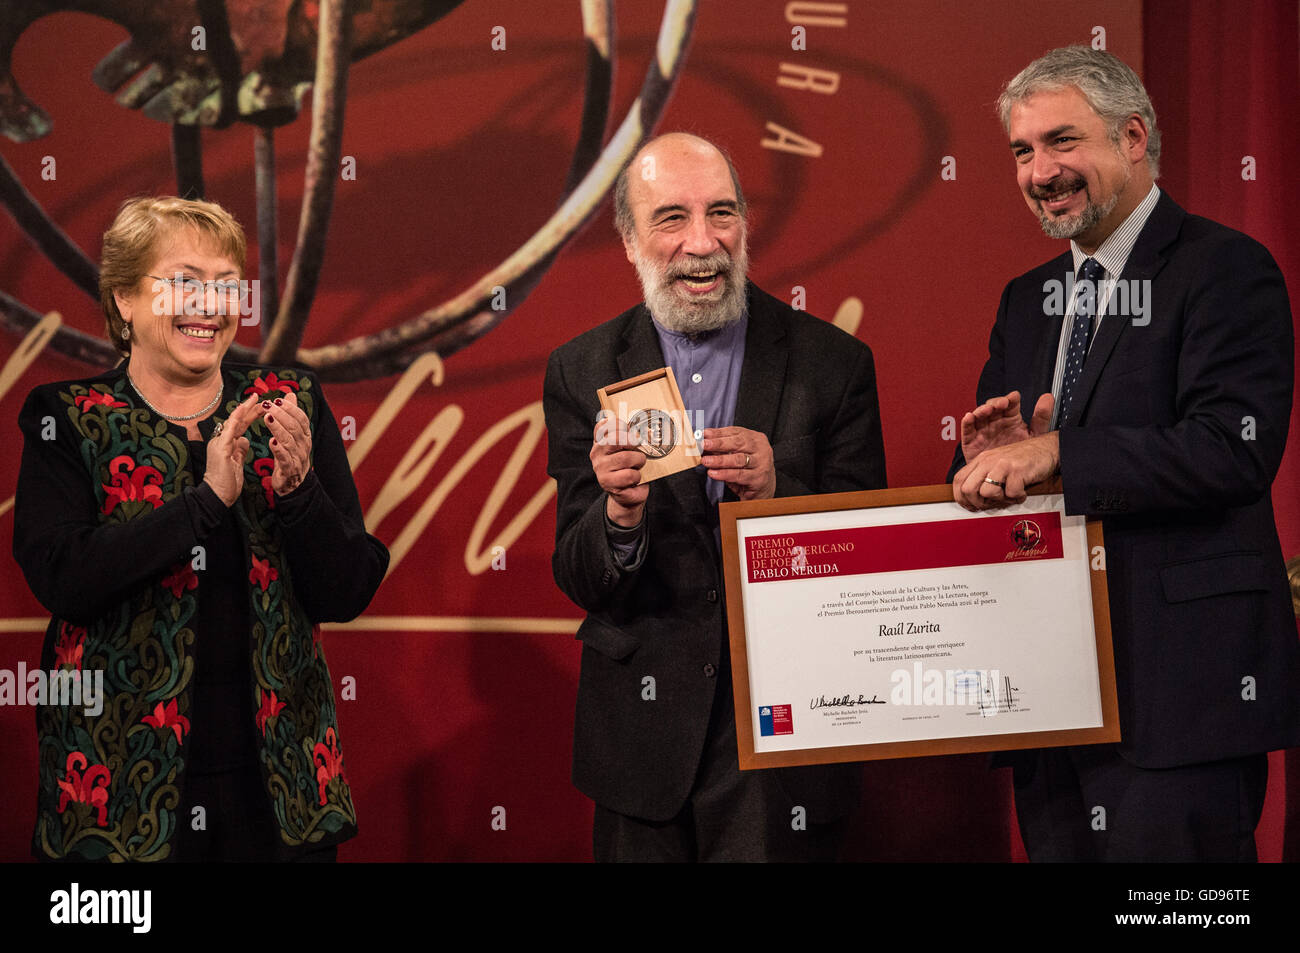 Santiago, Chile. 14th July, 2016. Chilean President Michelle Bachelet (L) delivers the Pablo Neruda Ibero-American - Stock Image